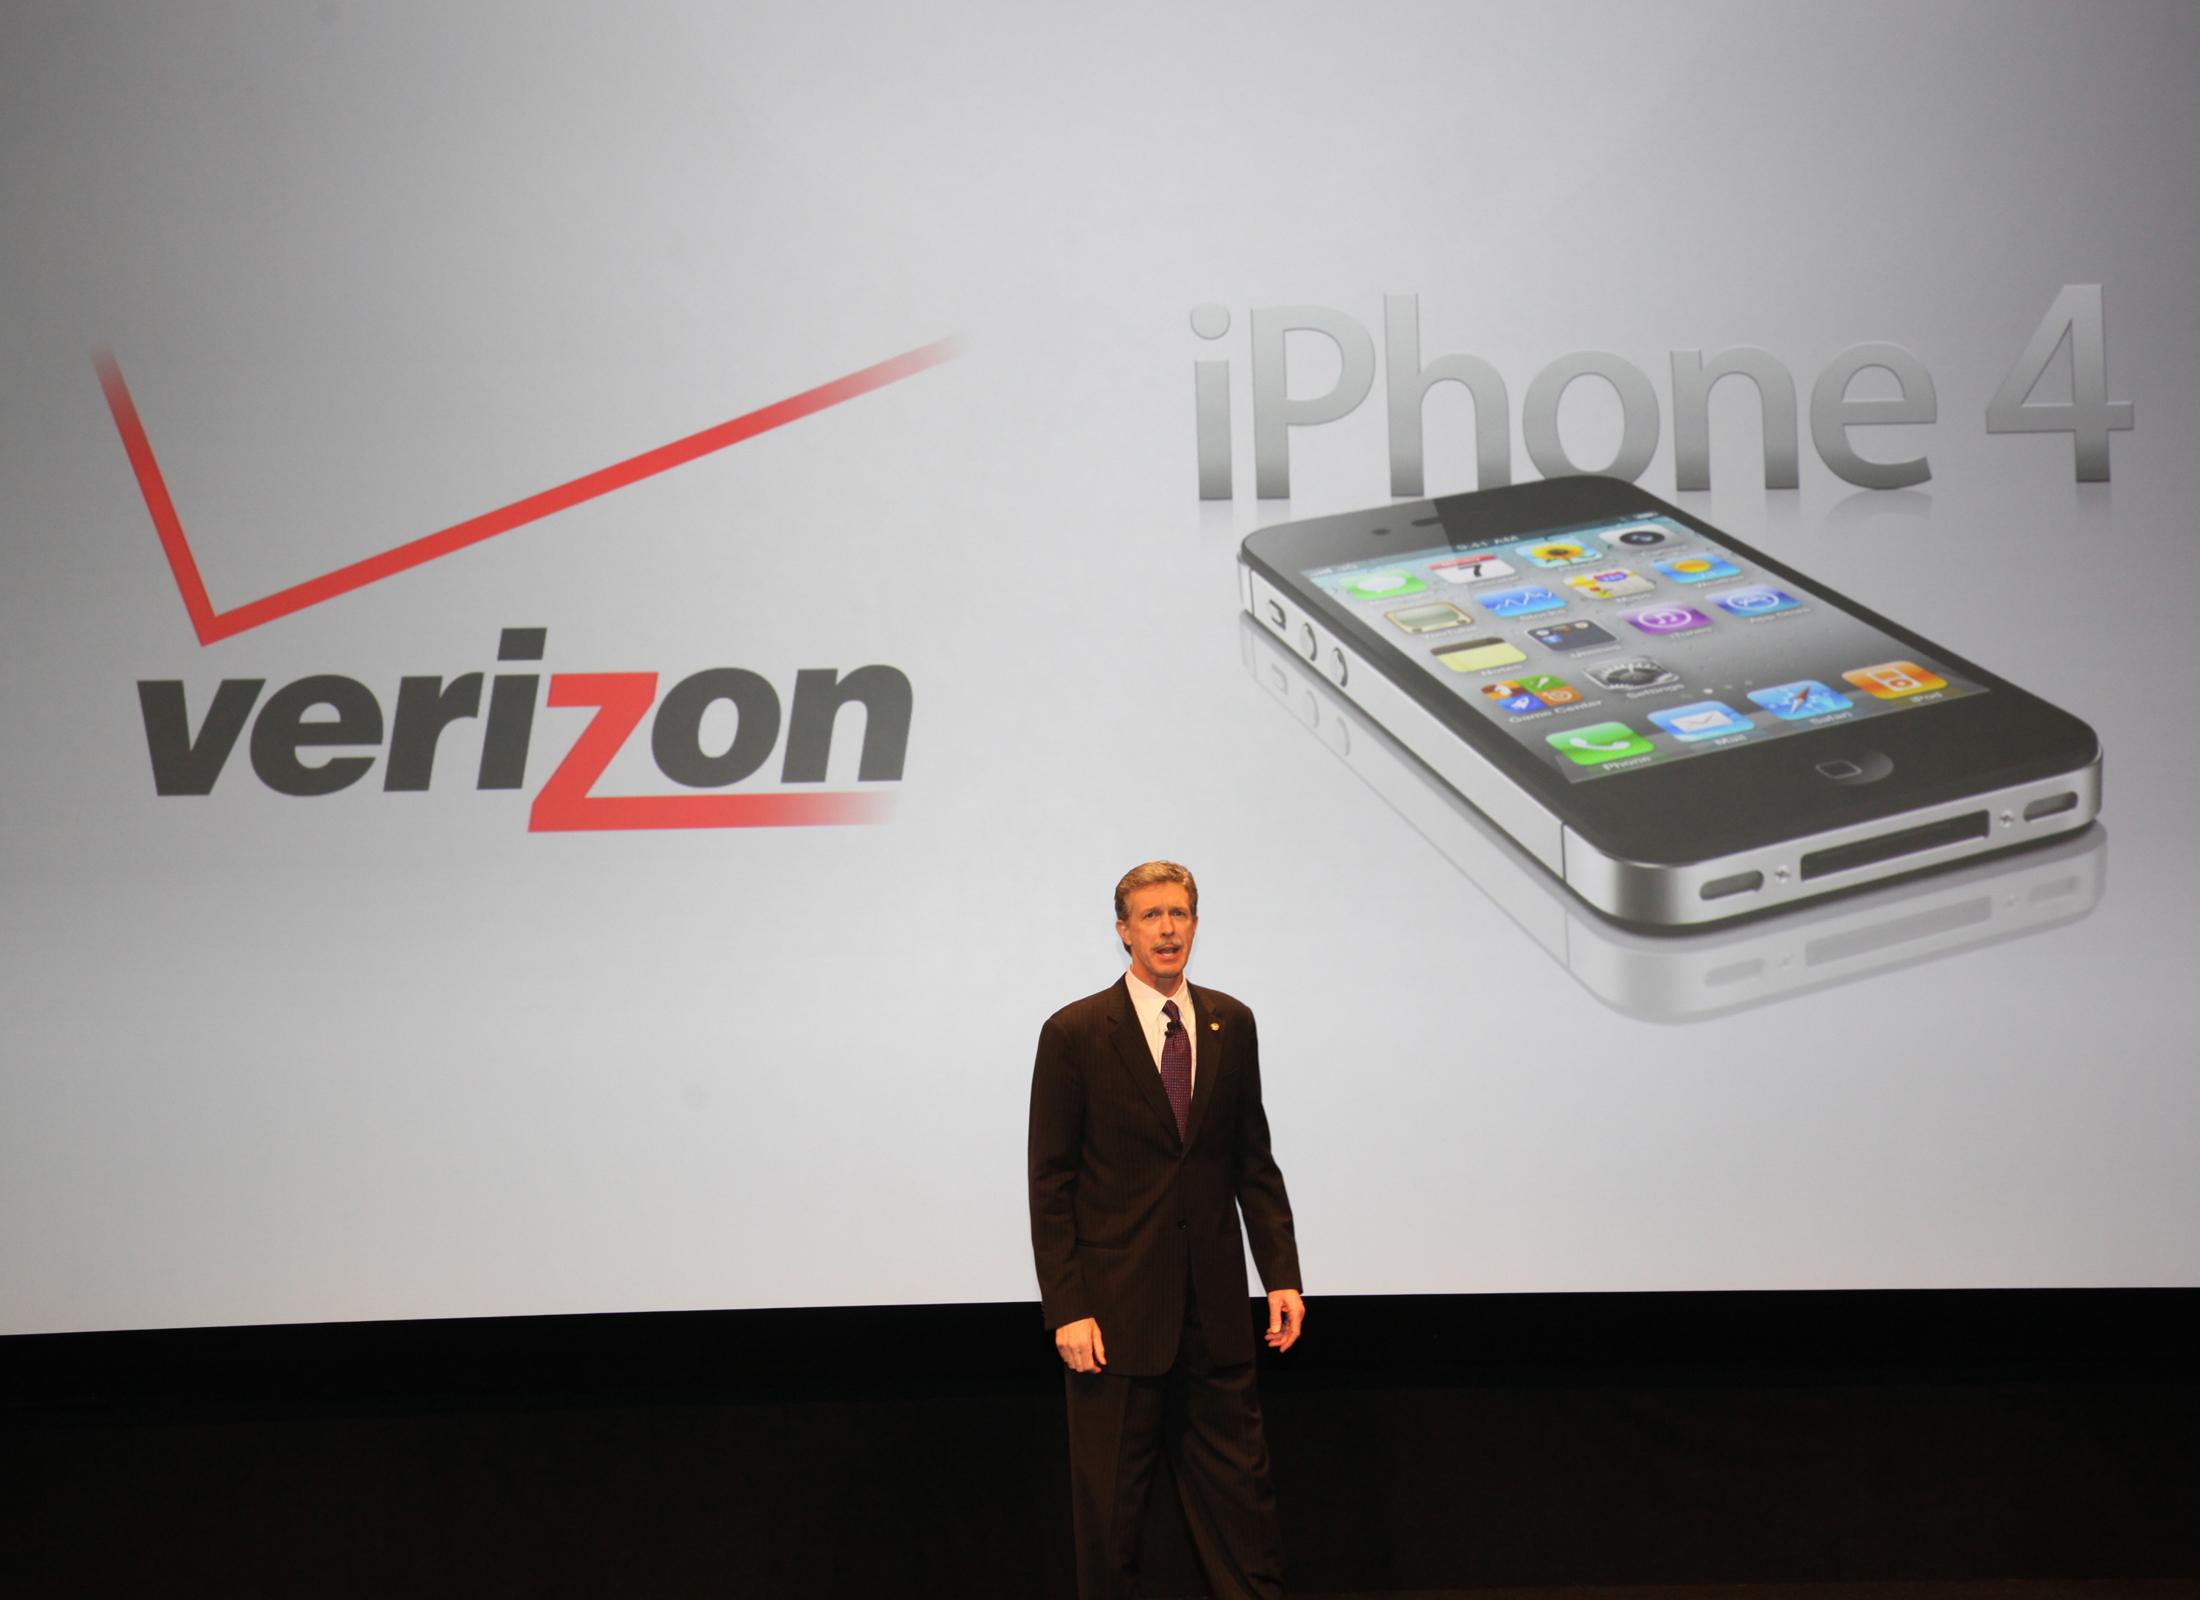 Verizon Wireless & Apple Team Up to Deliver iPhone 4 on Verizon